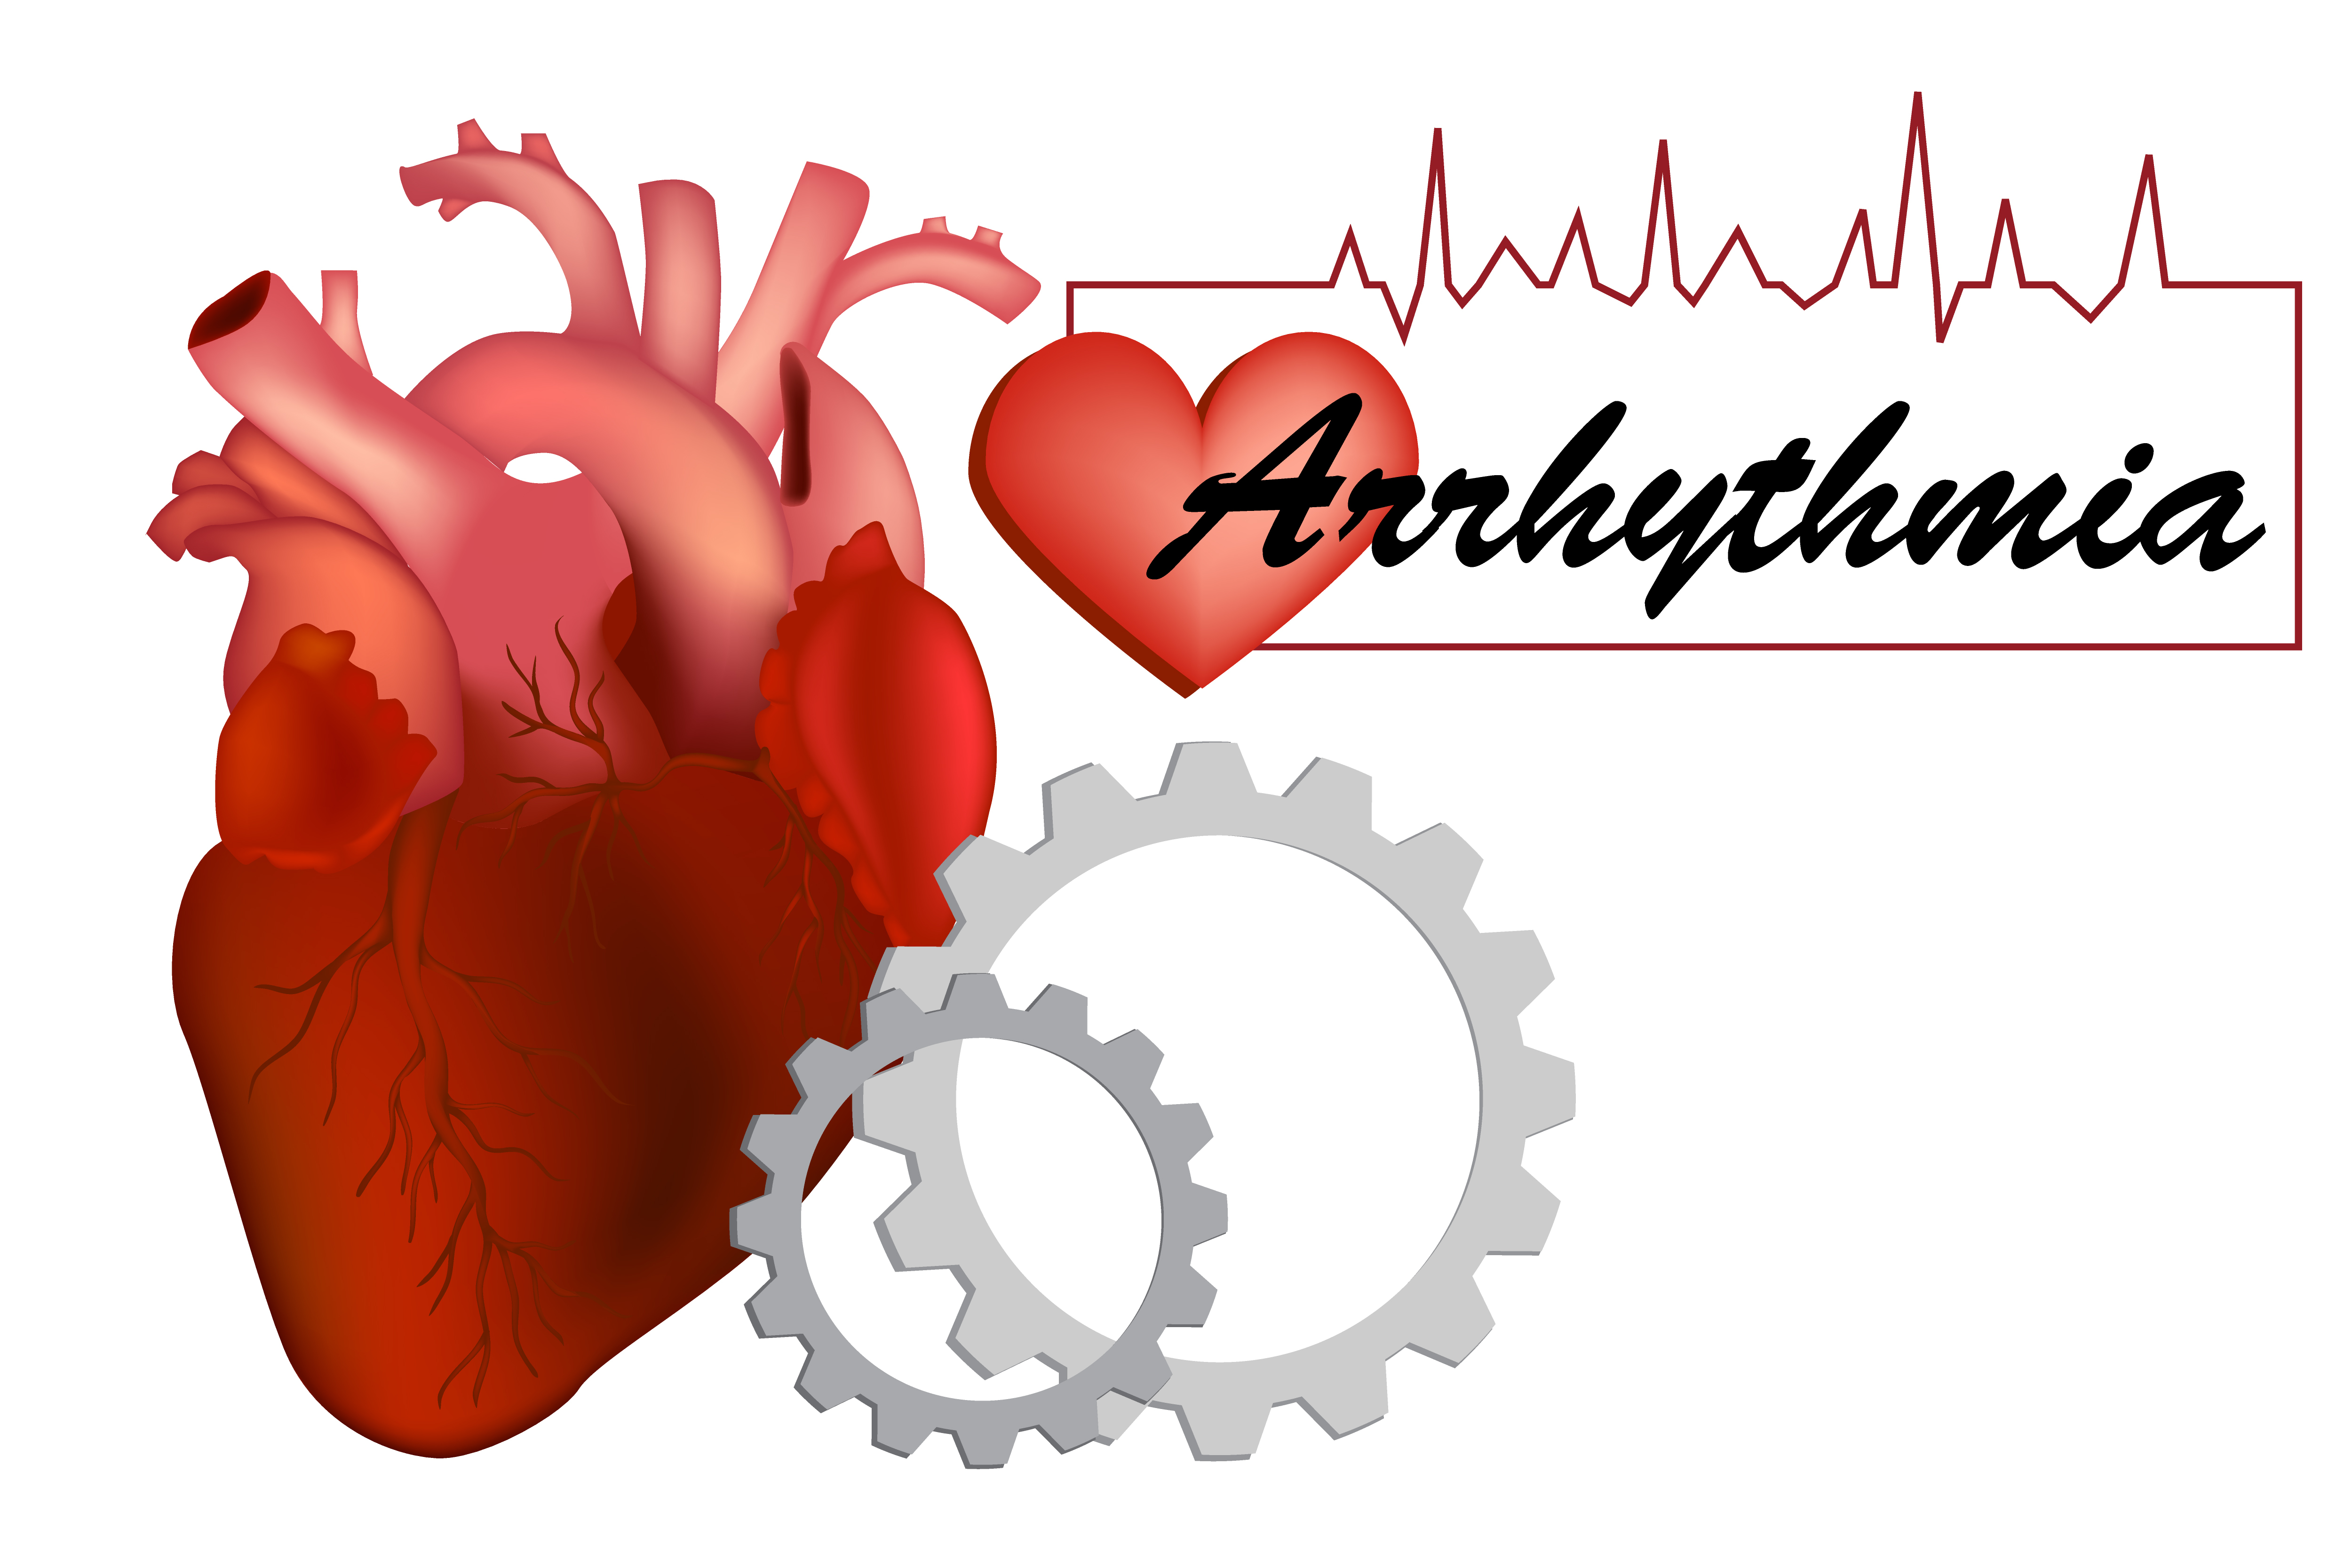 Arteriosclerotic heart disease